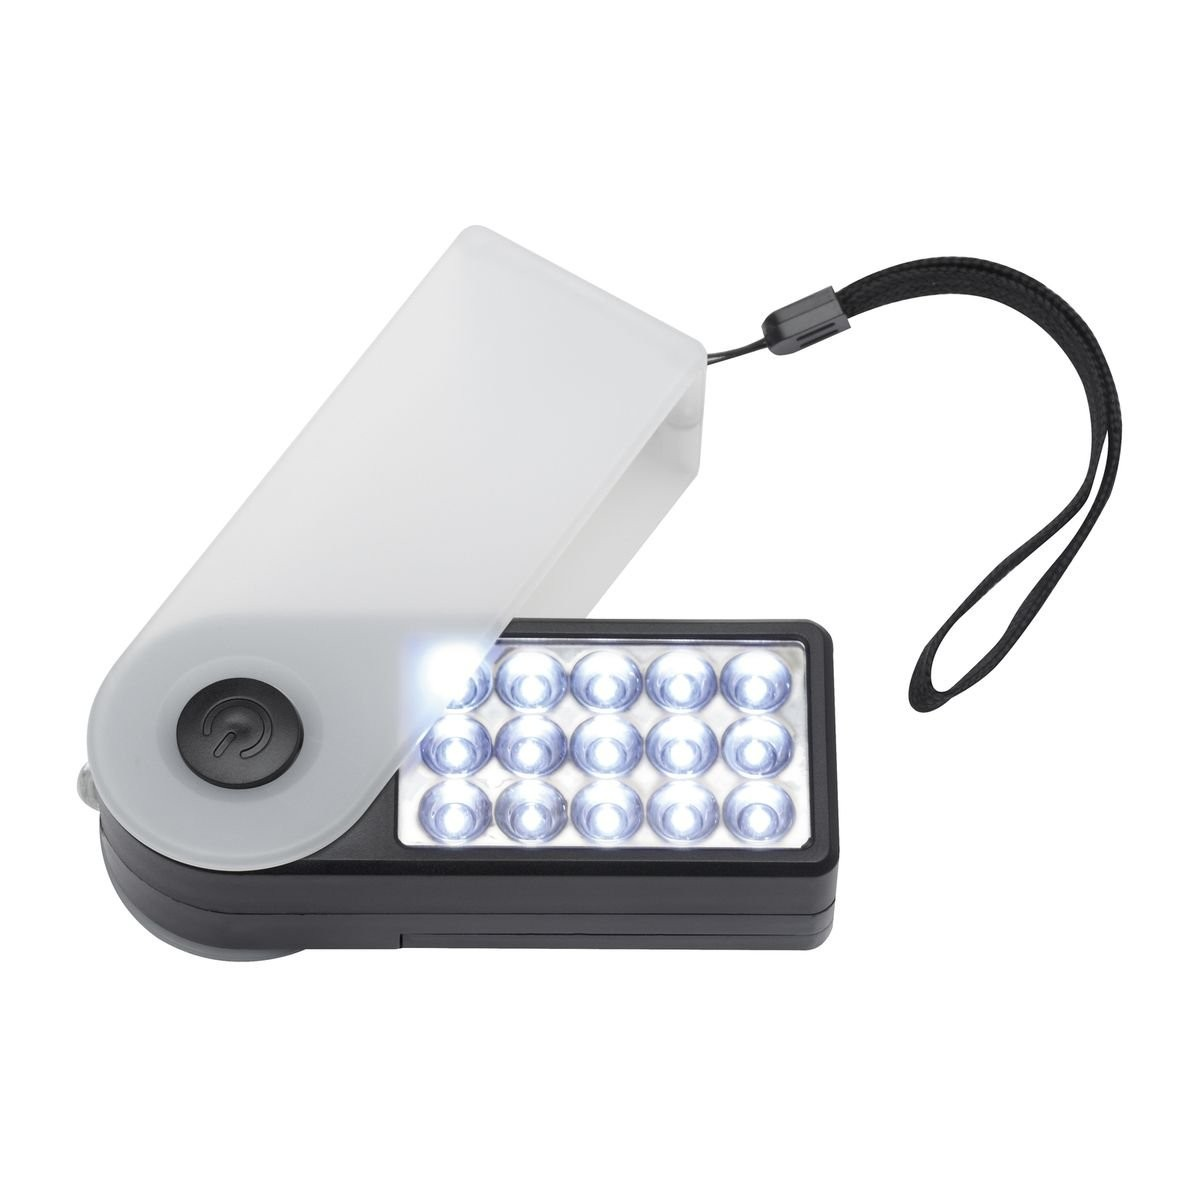 LED Taschenlampe REFLECTS-KEMI WHITE, Ansicht 3